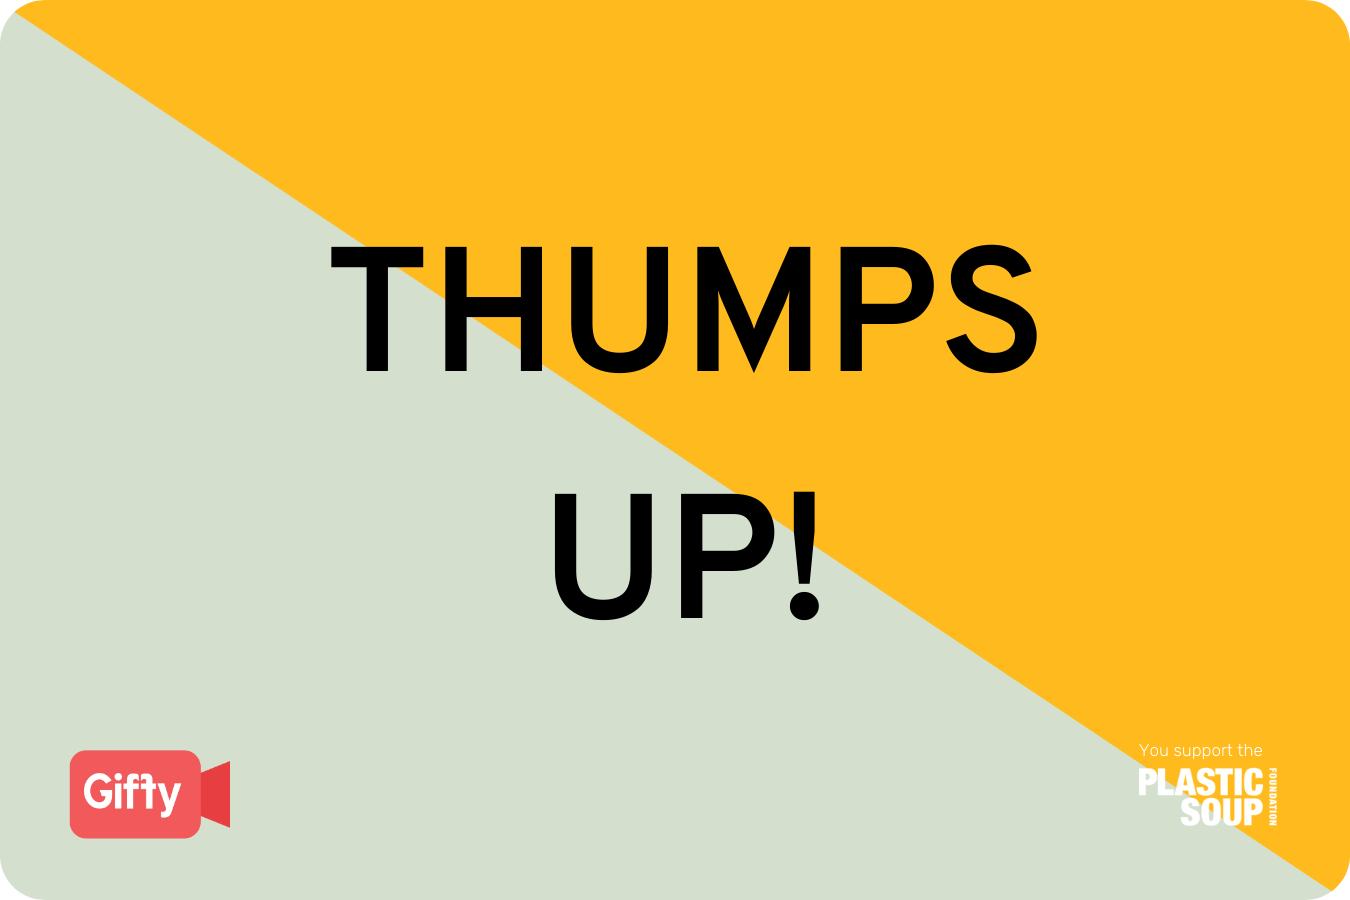 thumpsup-giffycard